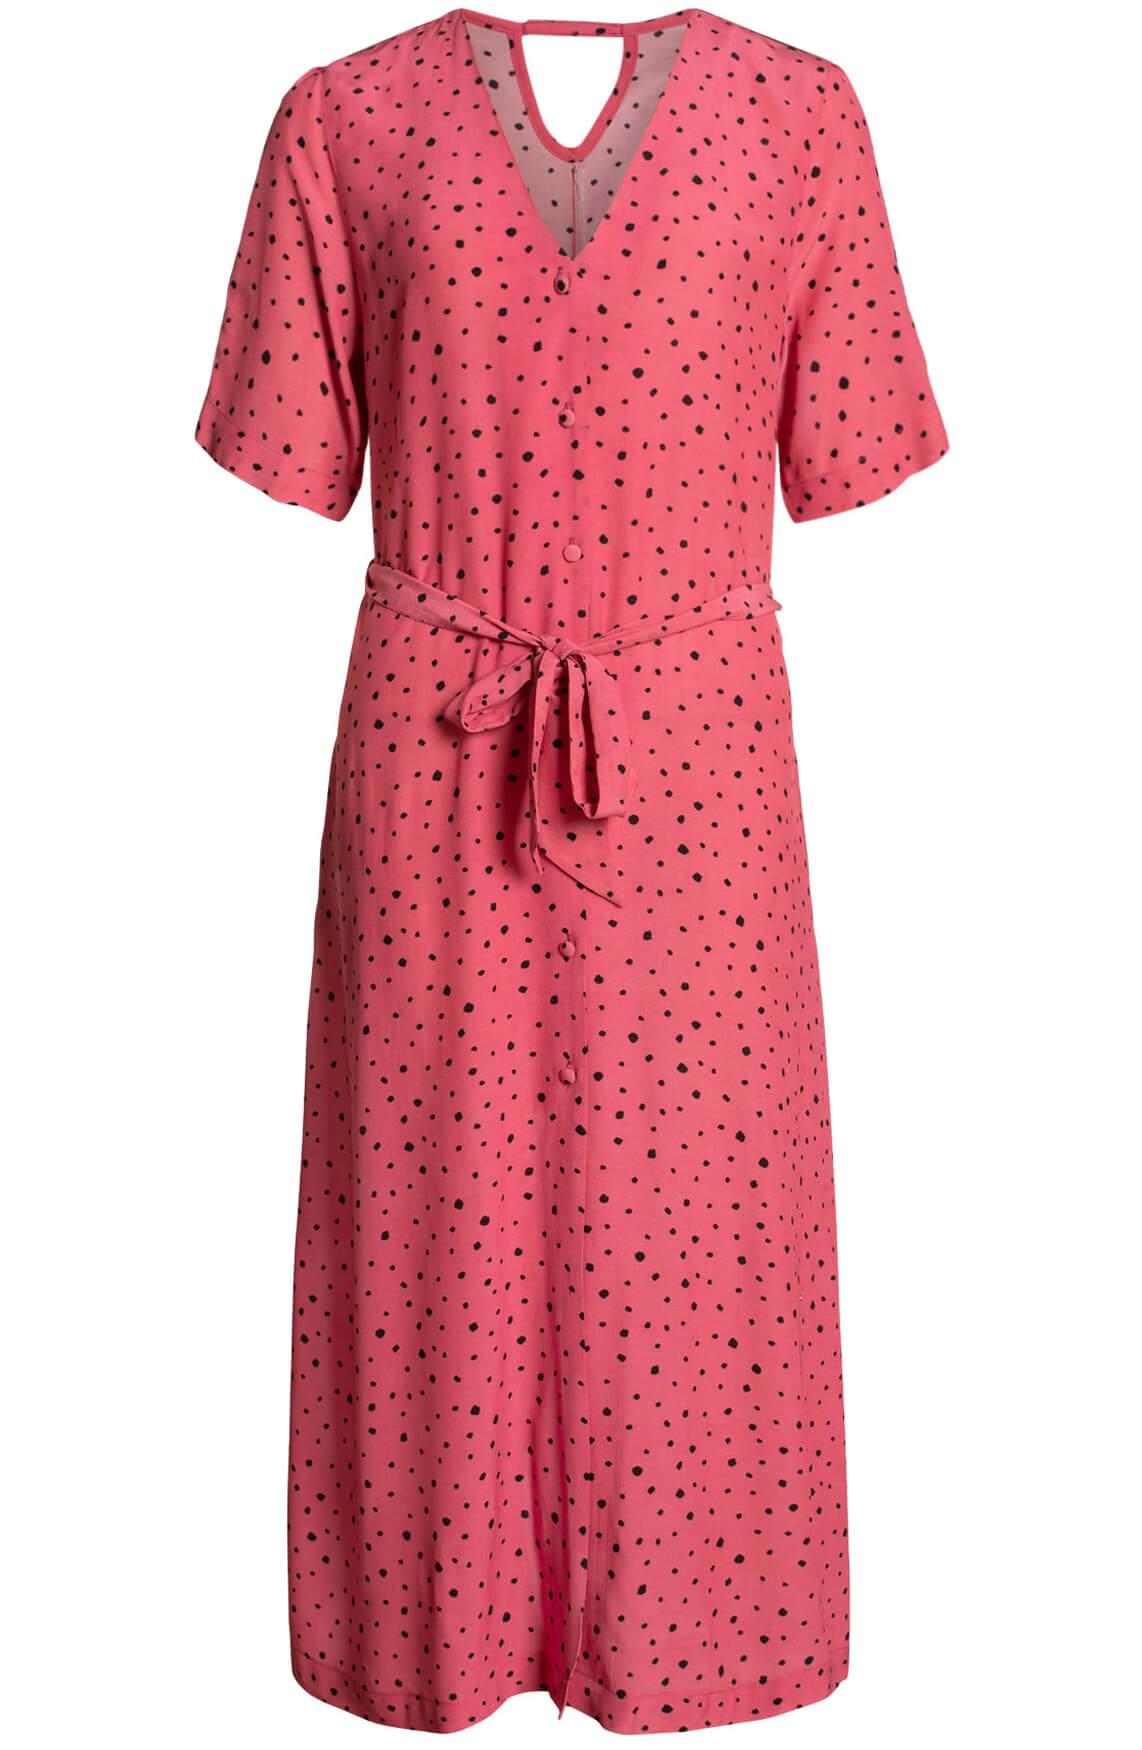 Anna Blue Dames Gestippelde jurk roze